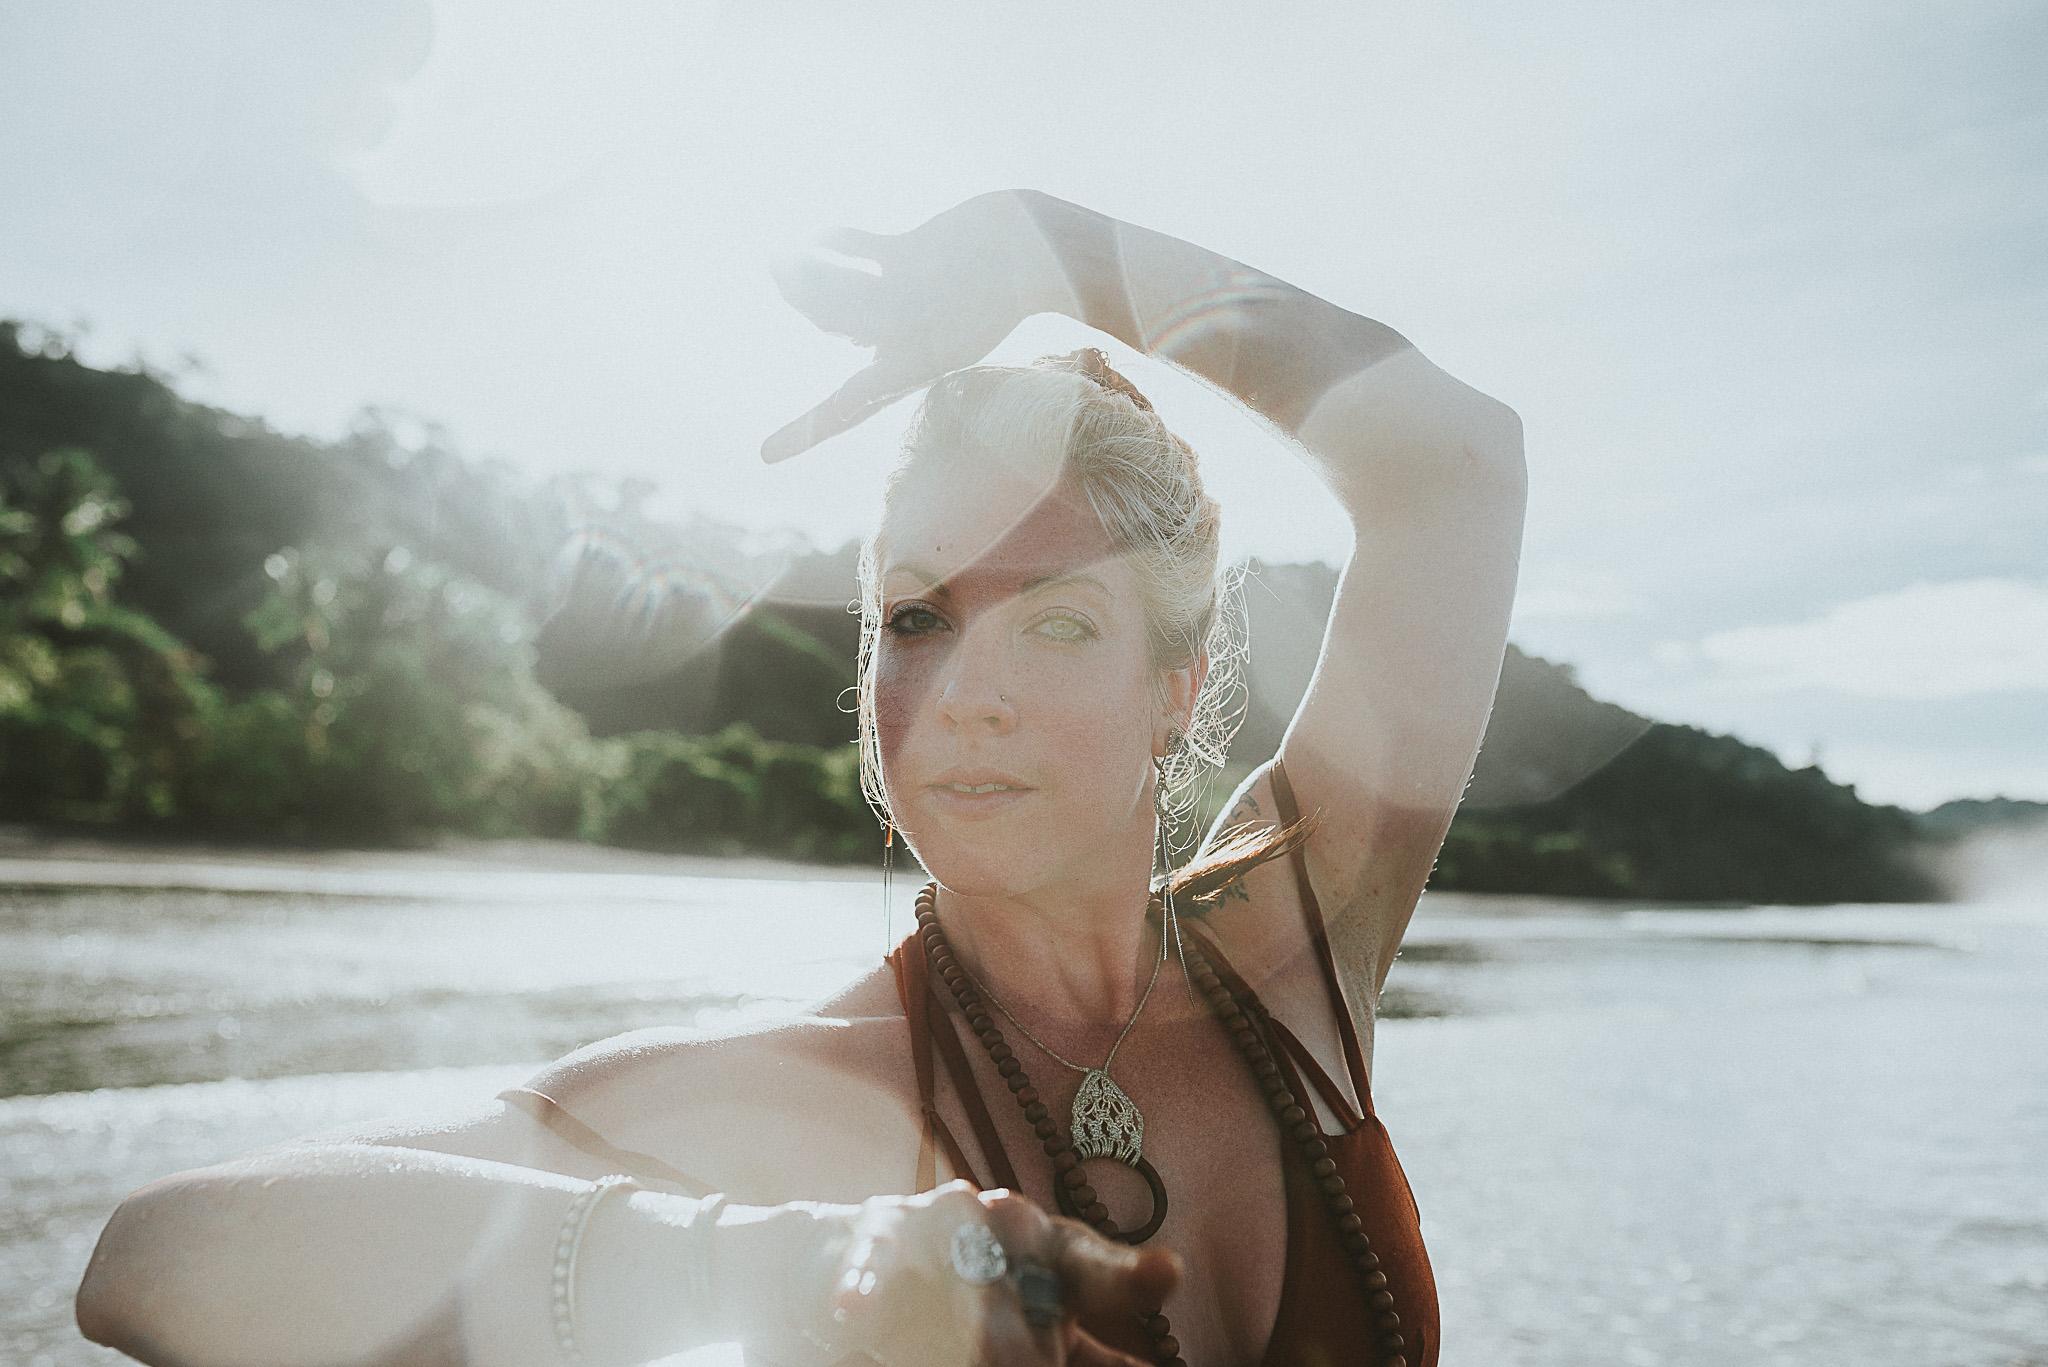 andrea amazing beach portrait light flares  (2).jpg